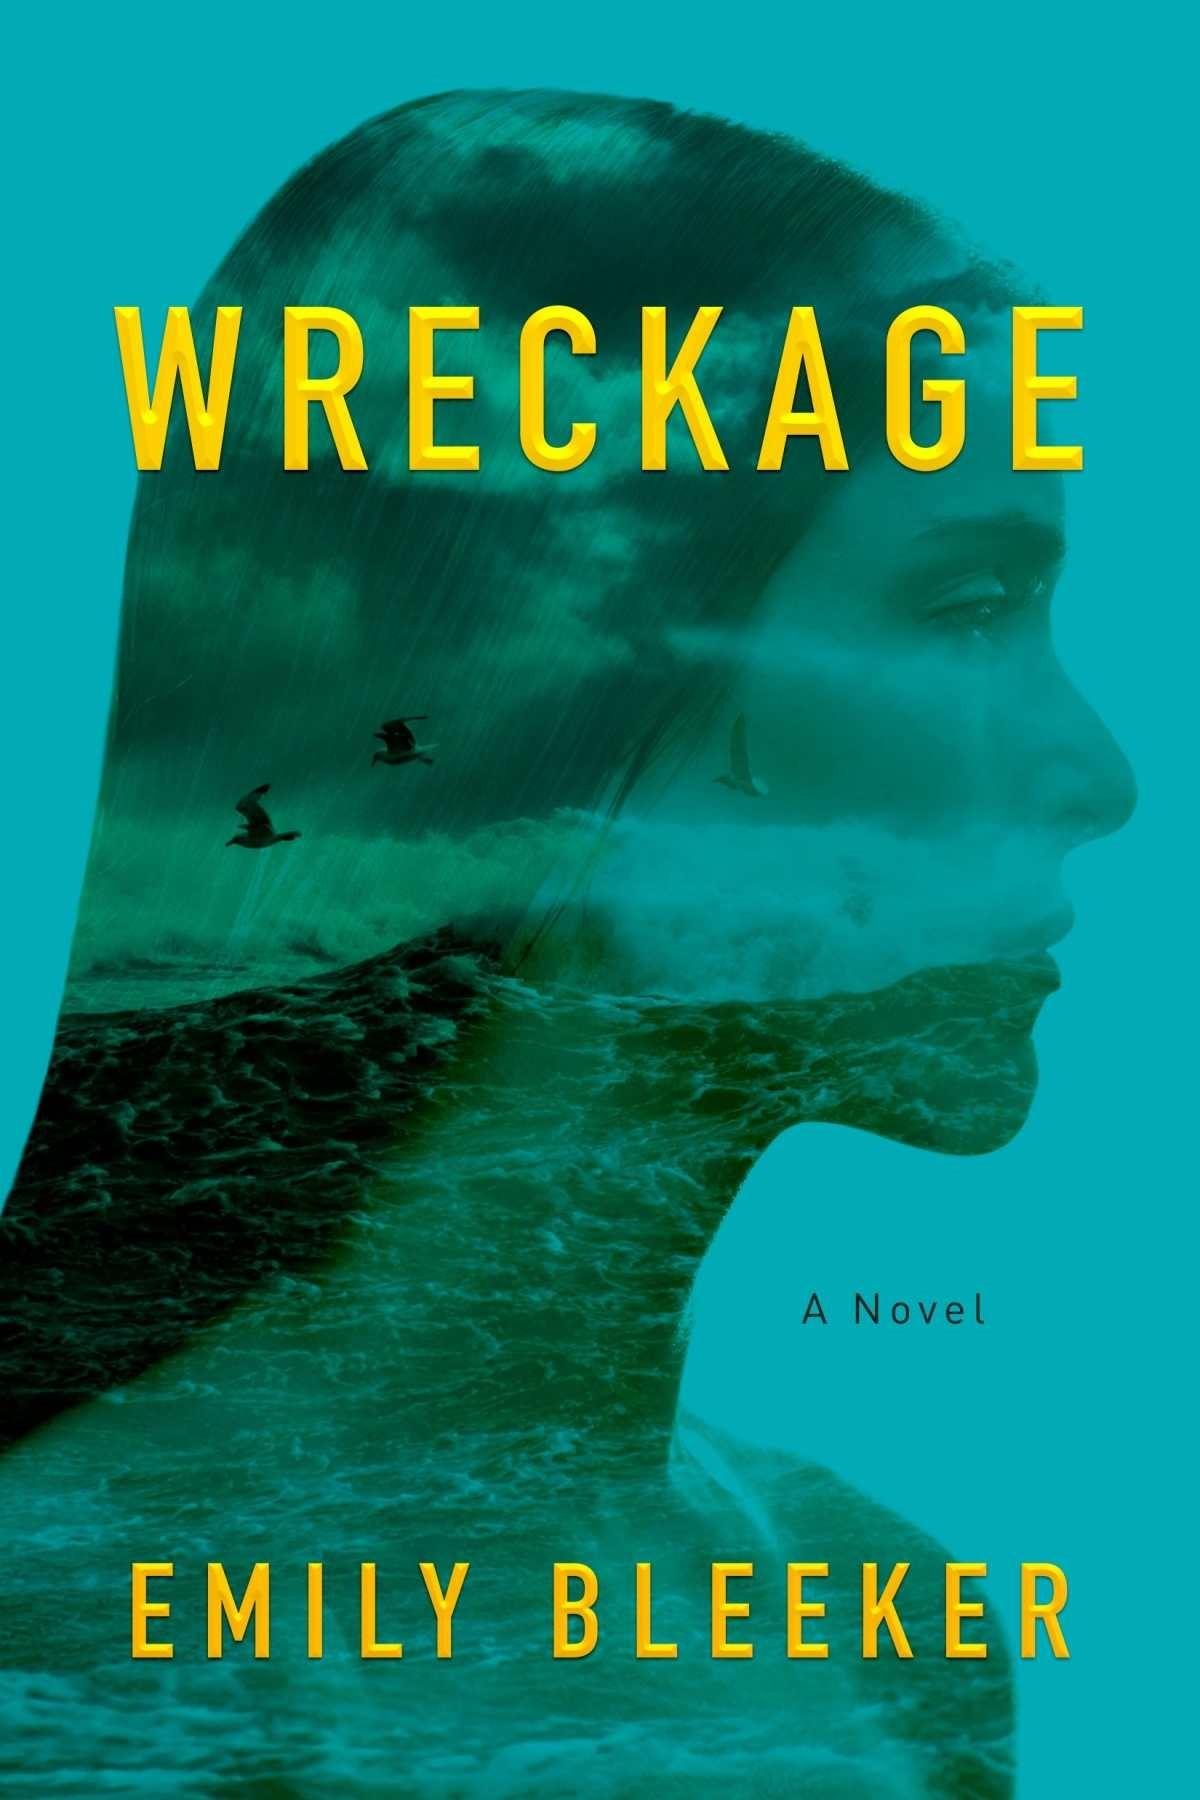 Wreckage - Emily Bleeker [kindle] [mobi]